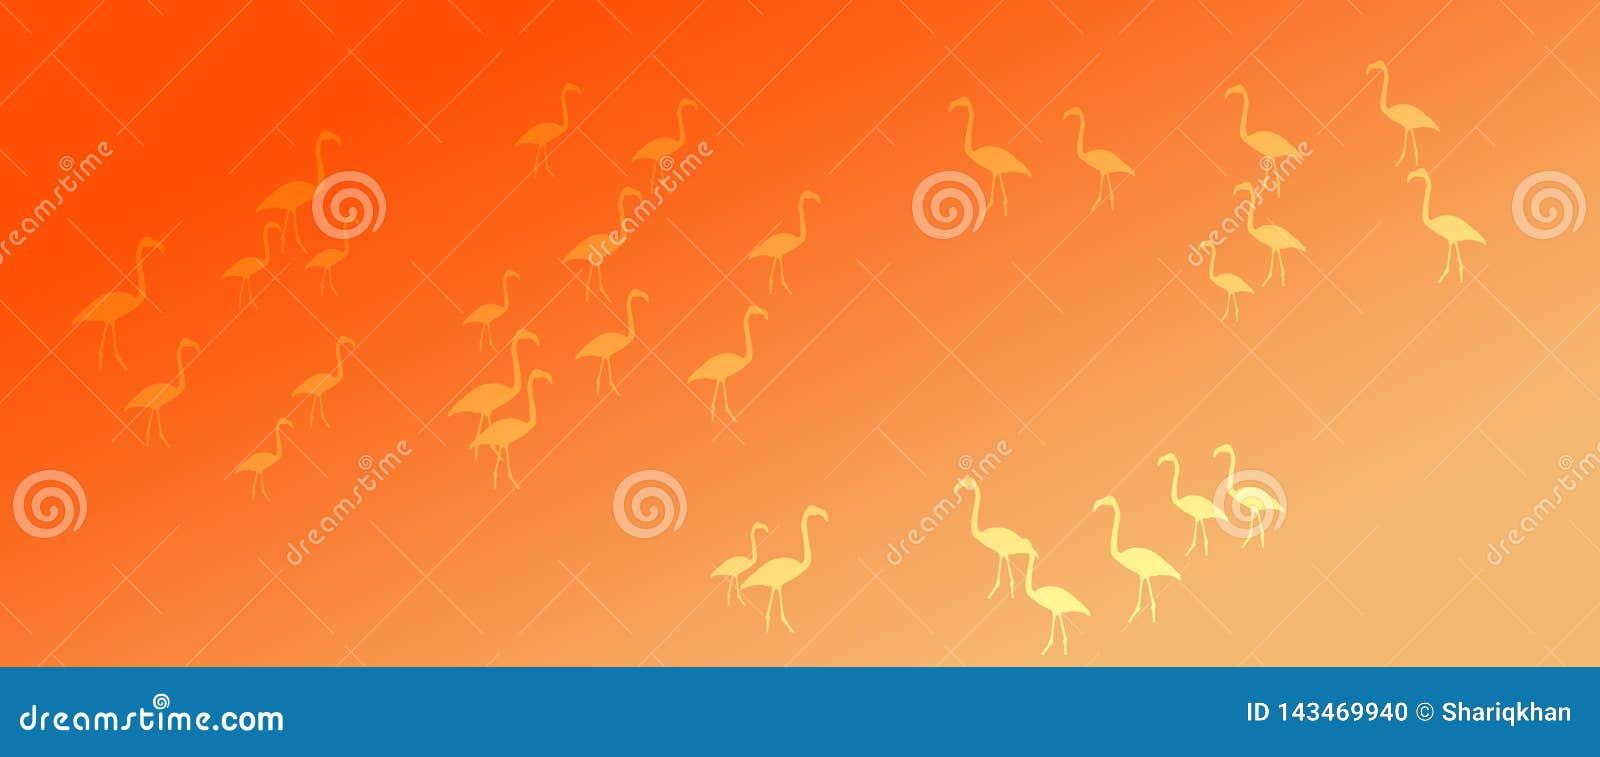 Header Background Orange Yellow Gradient Flamingo Birds